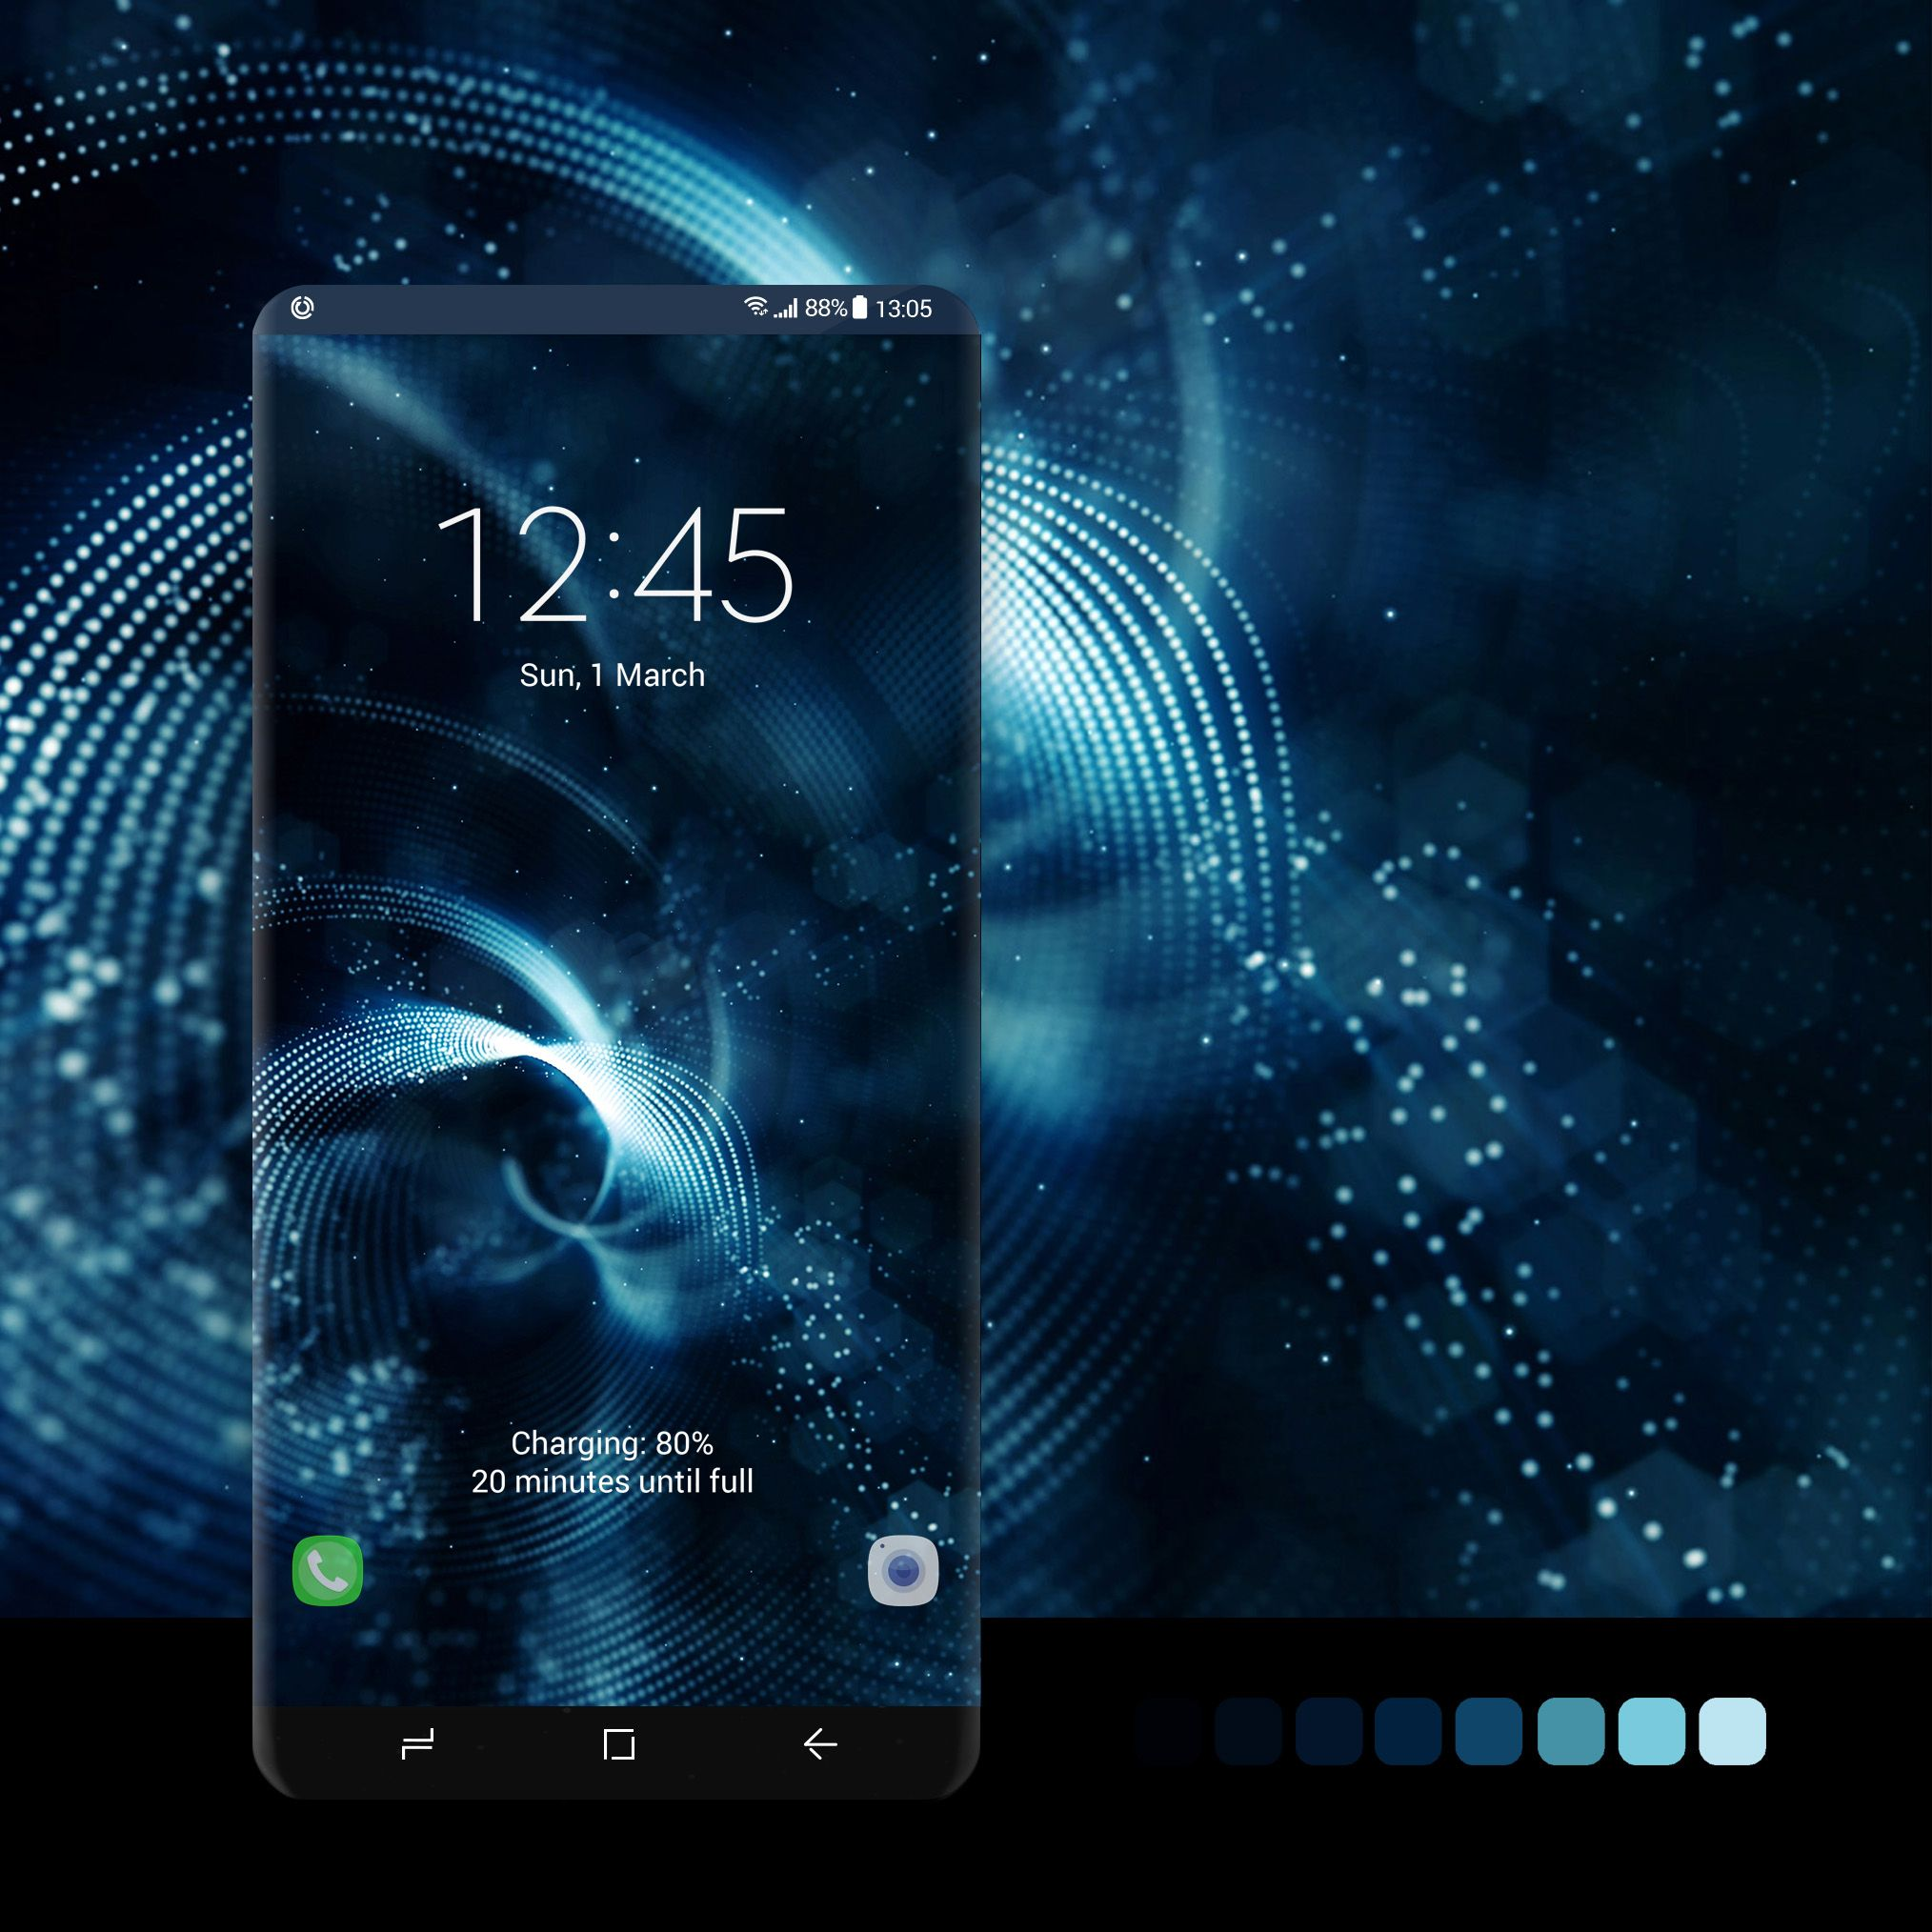 Dark blue twists wallpaper #wallpaper, #android, #phone